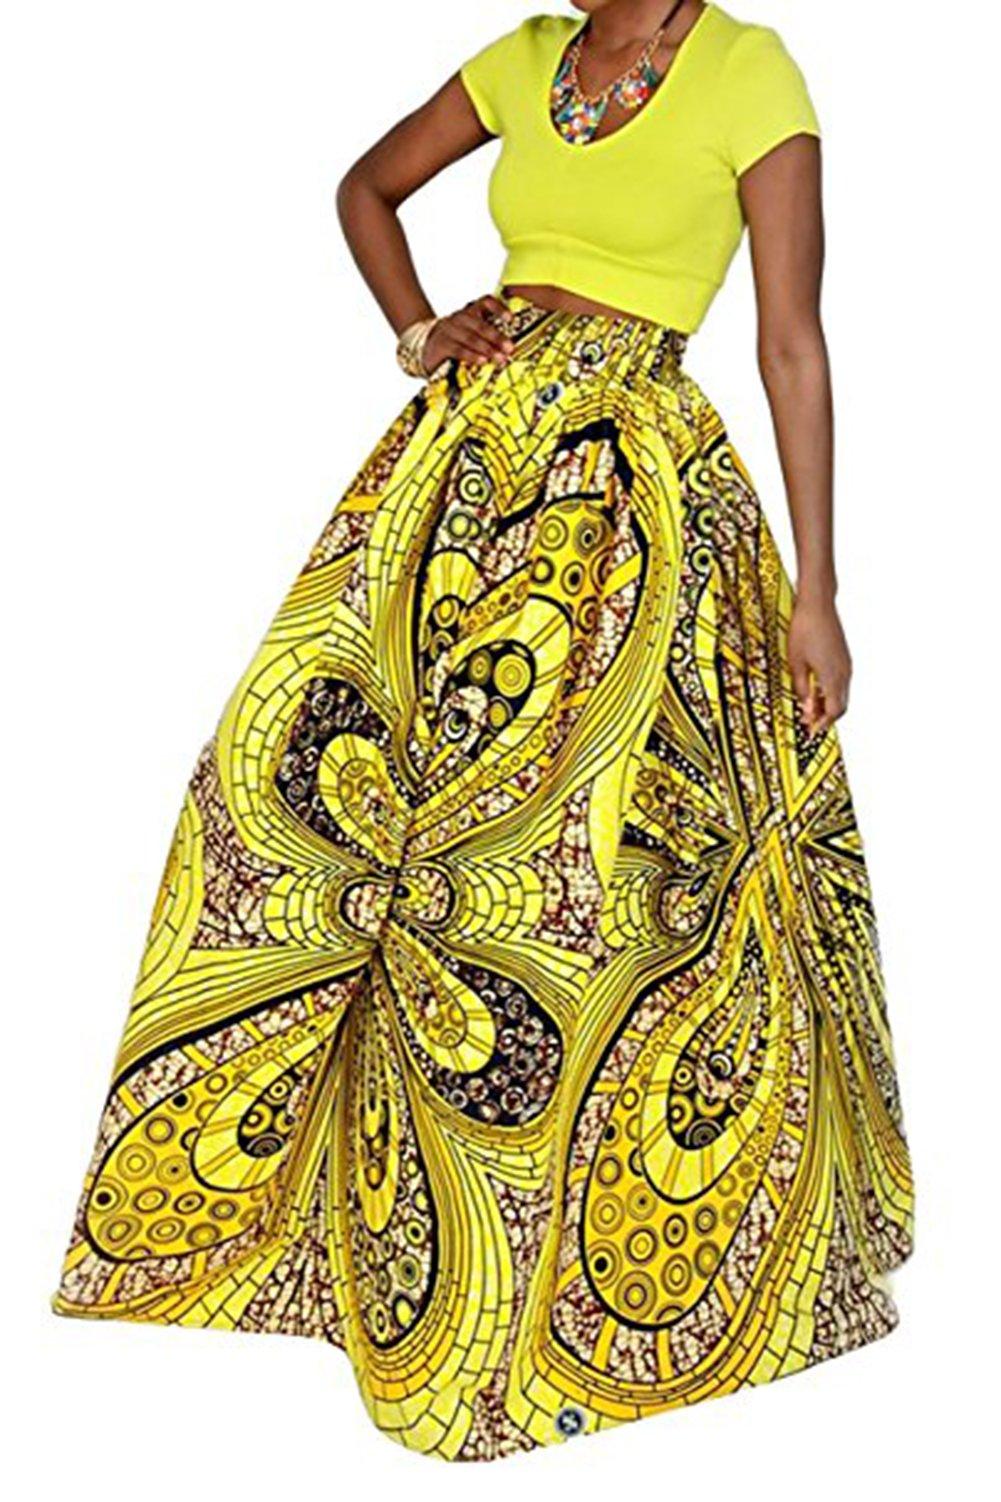 Aibearty Women S-XXL Fashionable Multicolored Elastic Print High Waist Maxi Skirts Beach Skirt Long Skirts … (XXXL, A0098l)